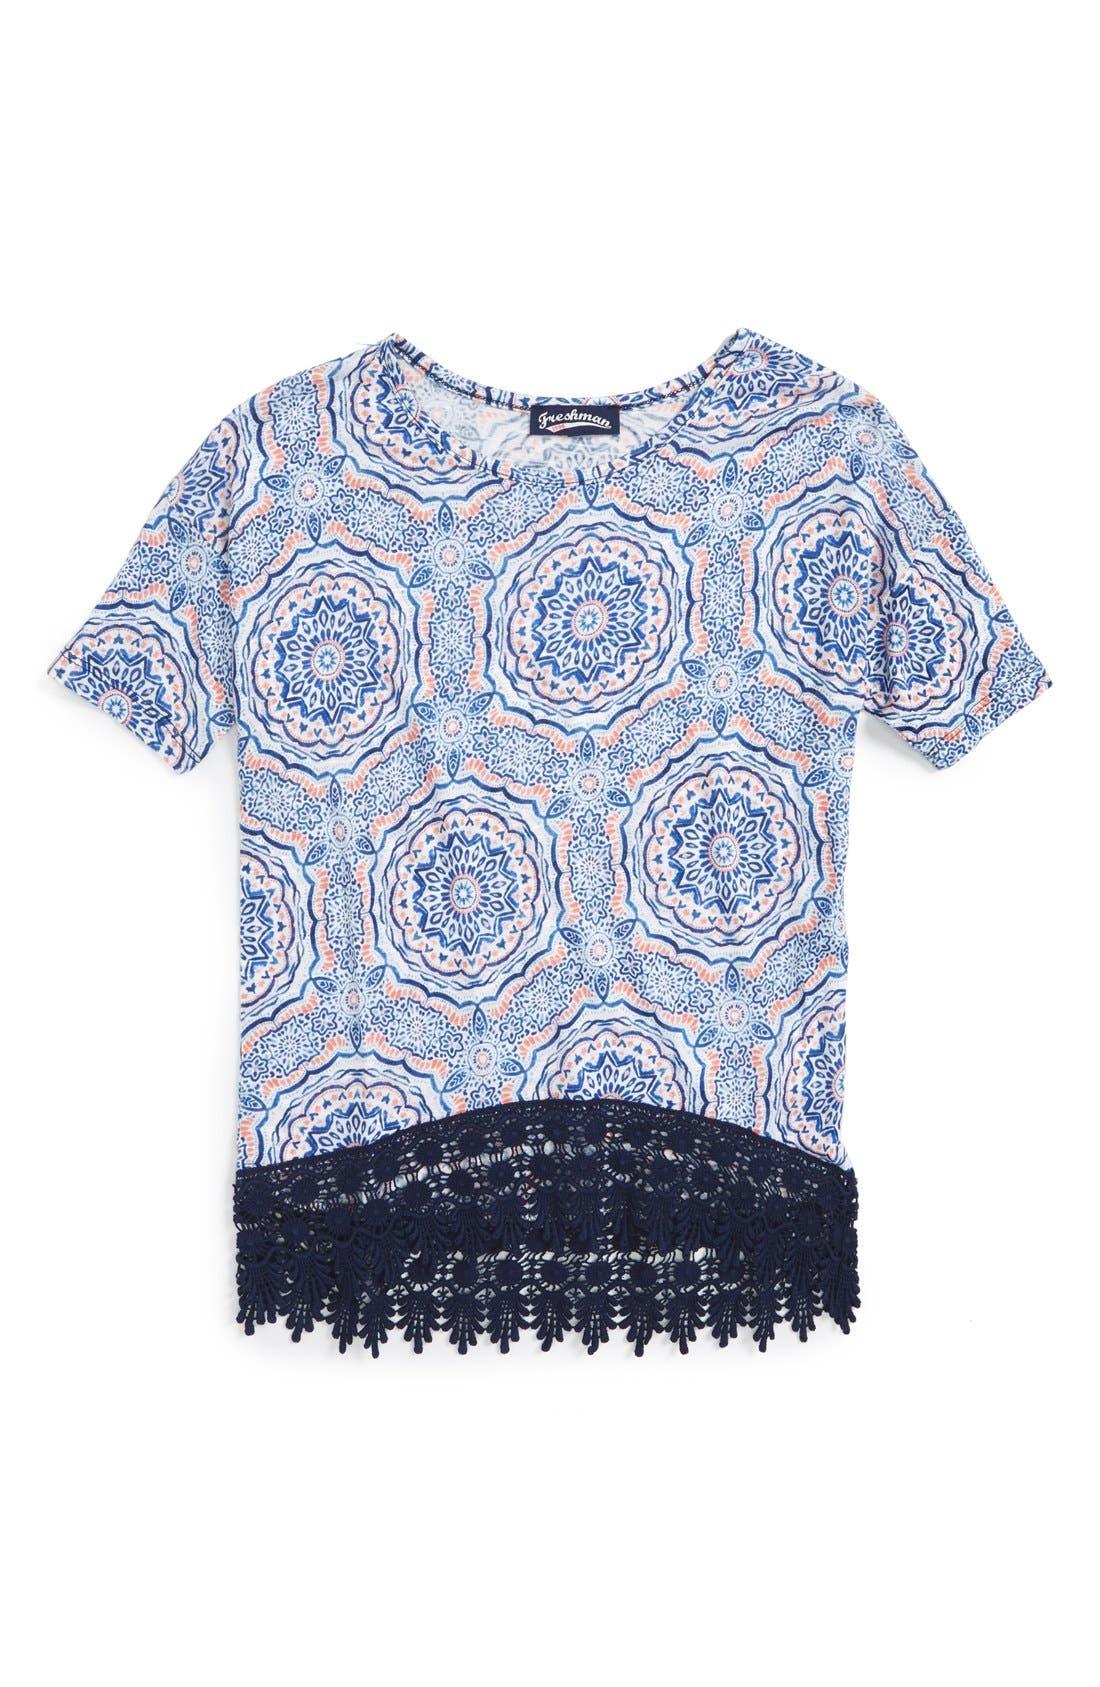 Main Image - Freshman Print Crochet Trim Tee (Big Girls)